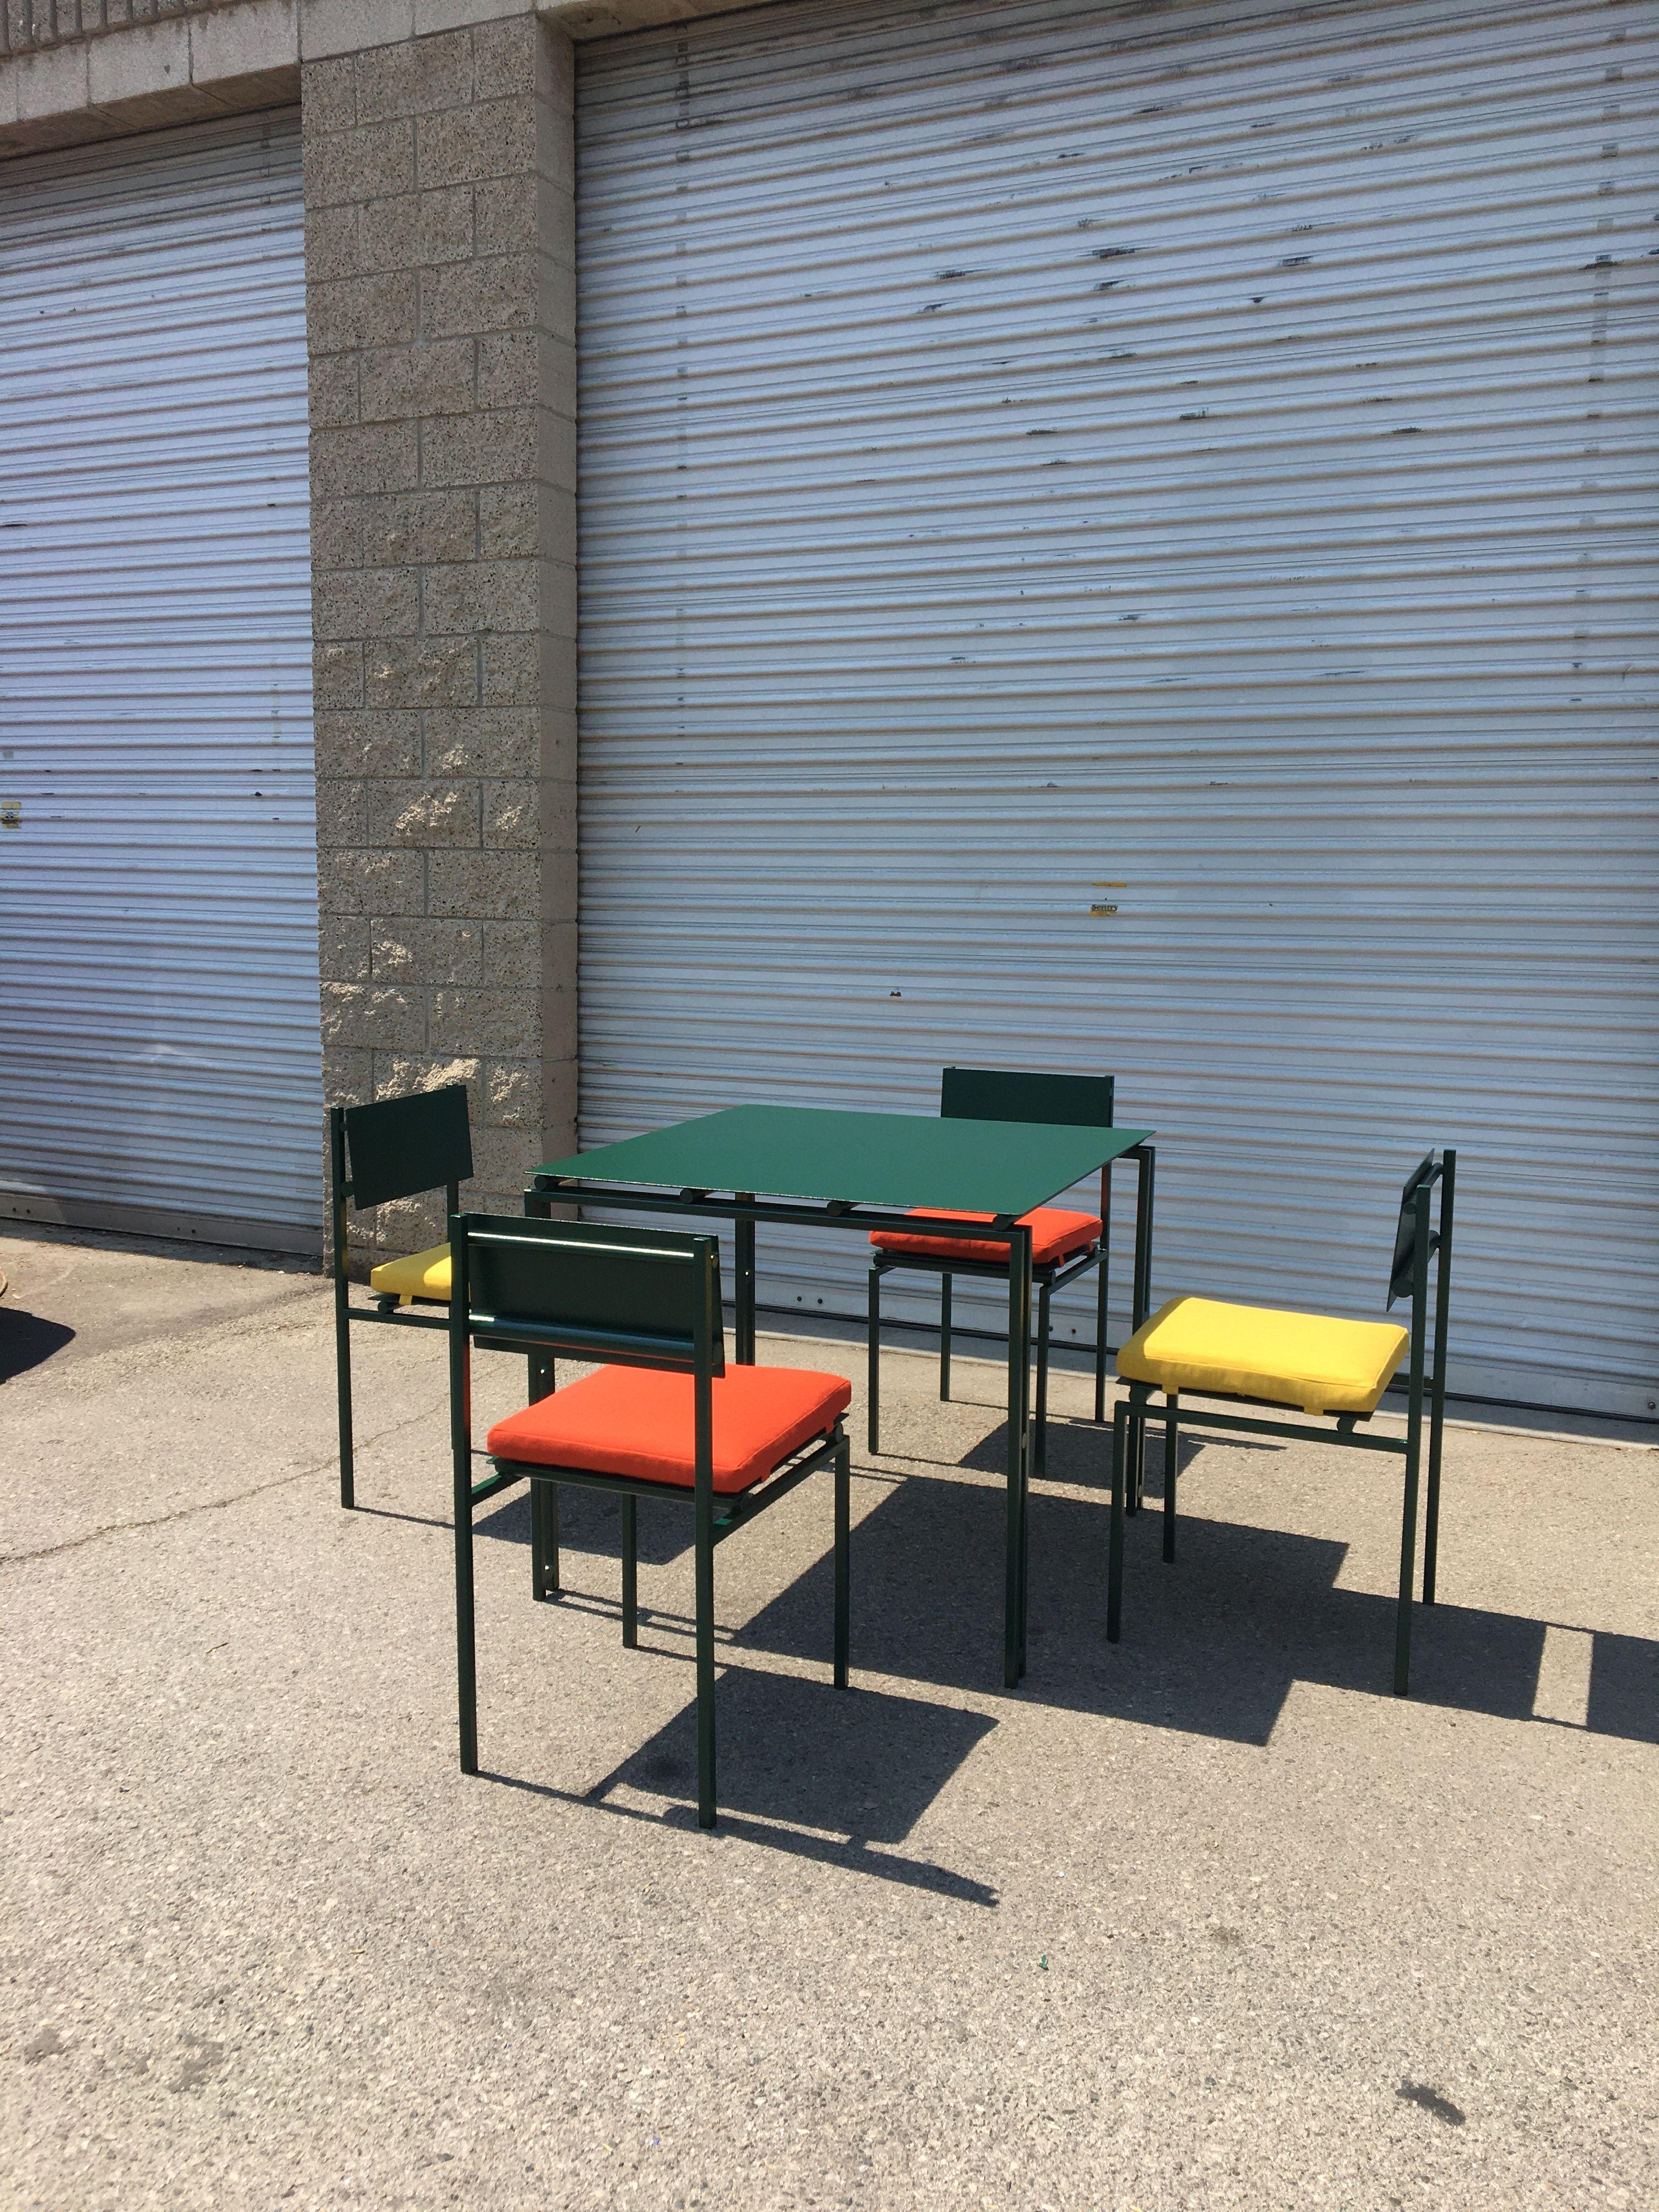 Suspension Metal Set - Breakfast Size product image 8